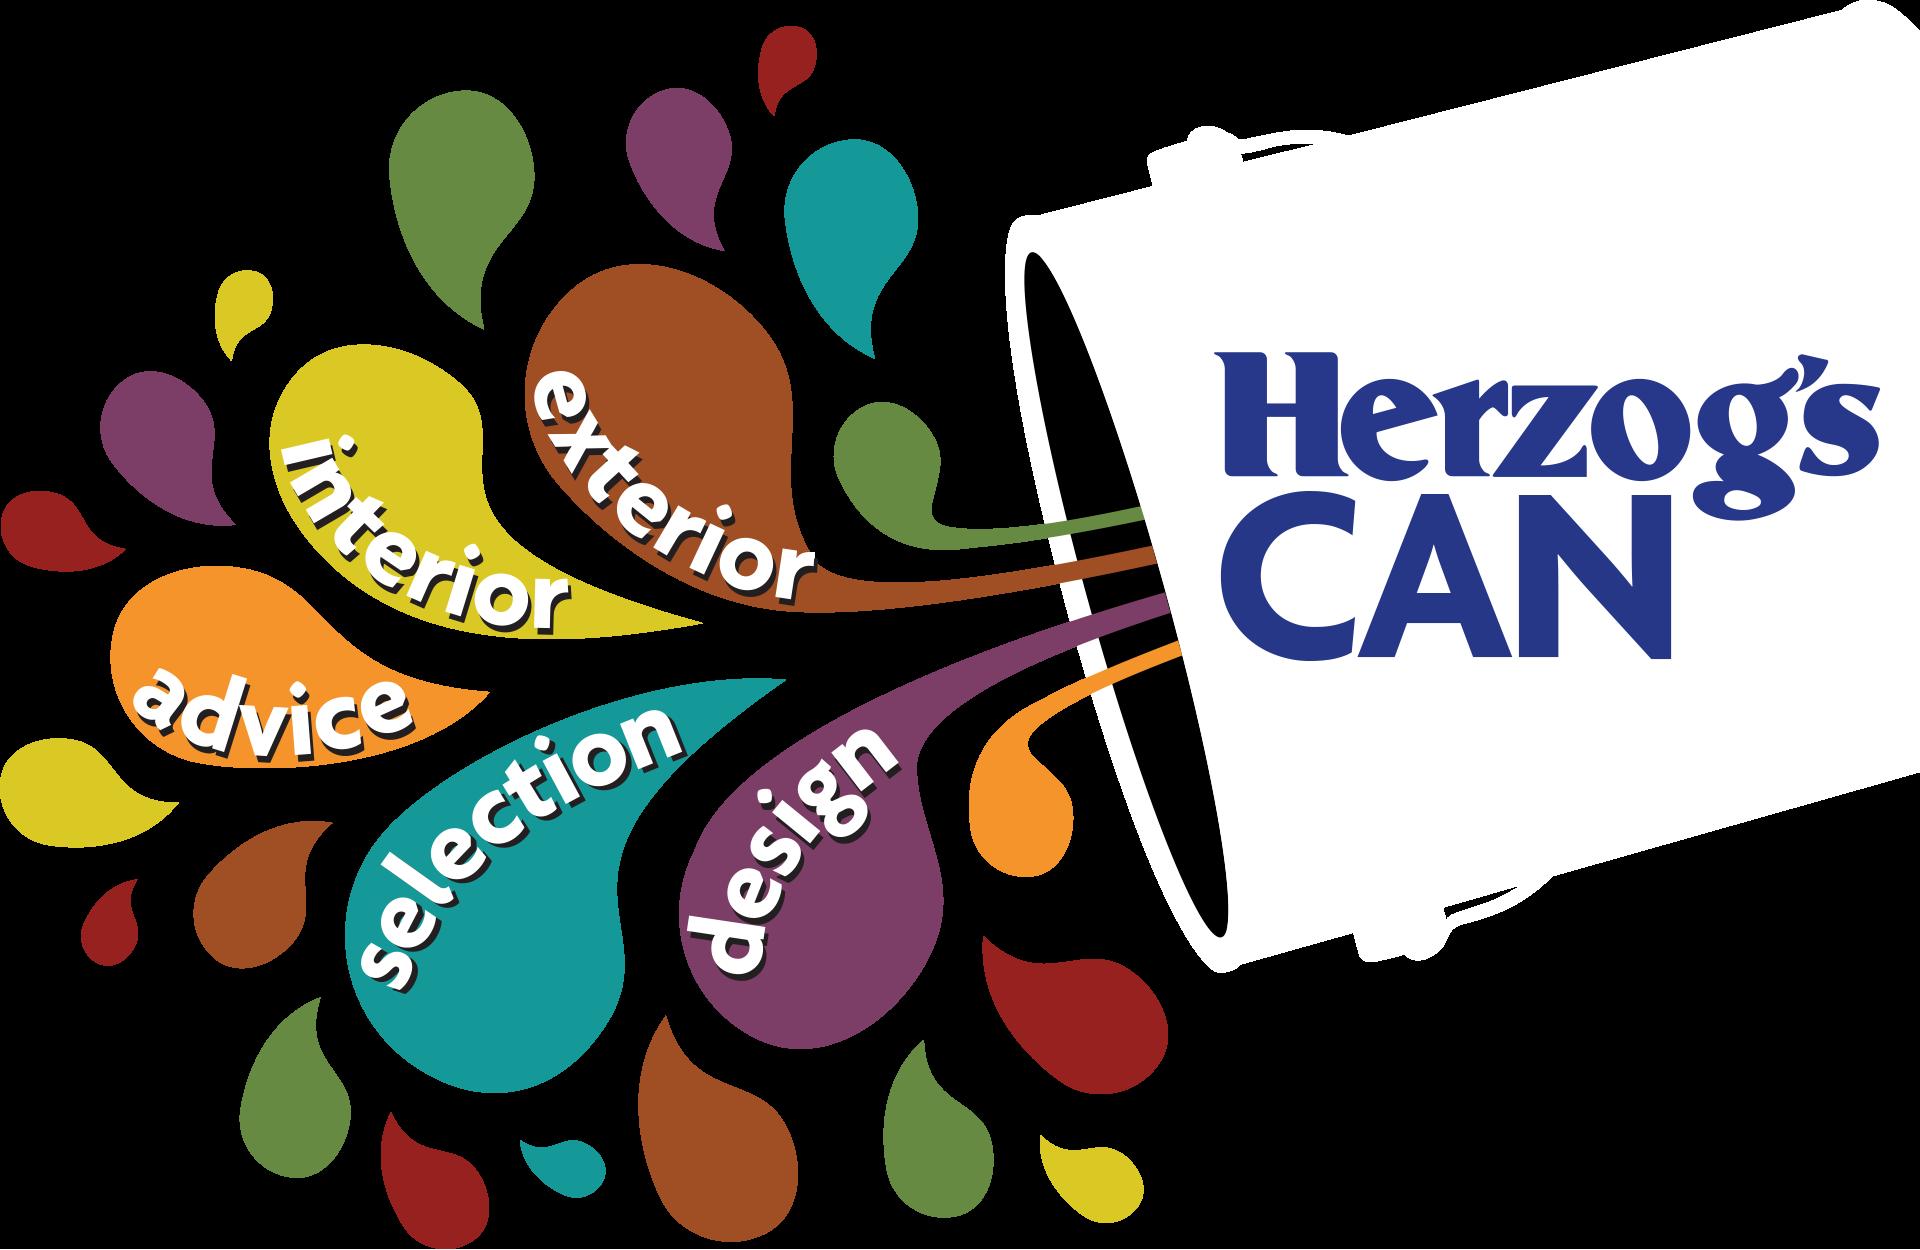 Herzog's CAN - Advice, Selection, Design, Interior, Exterior